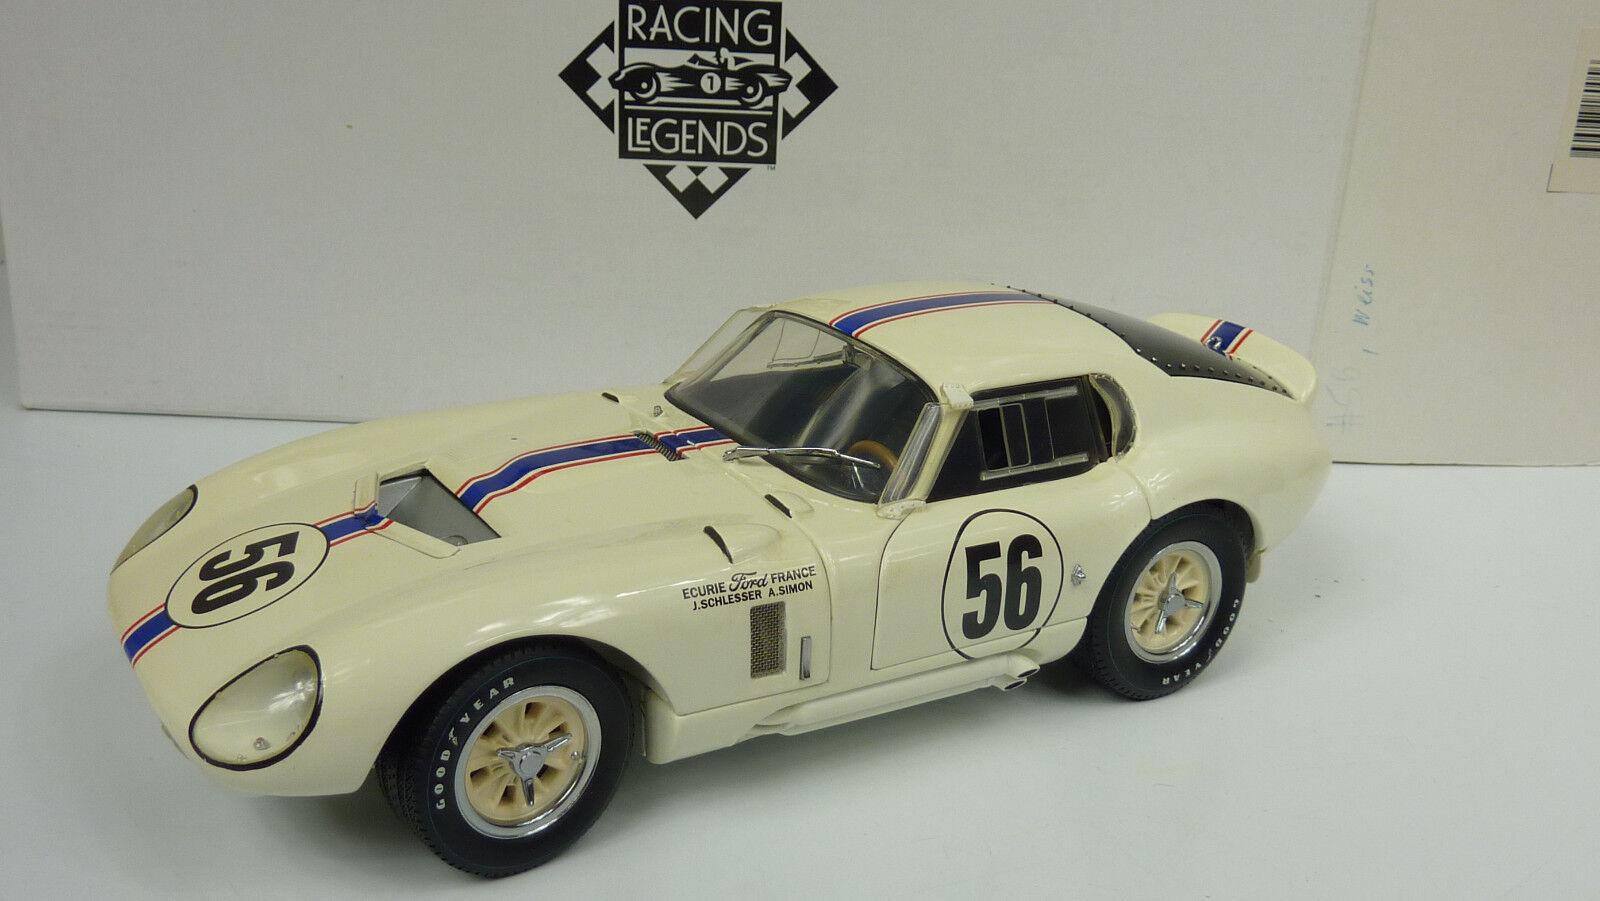 Exoto Racing Legens 1 18 SHELBY COBRA COBRA COBRA DAYTONA COUPE 1965 in OVP (A659)  | Vielfalt  b530b1